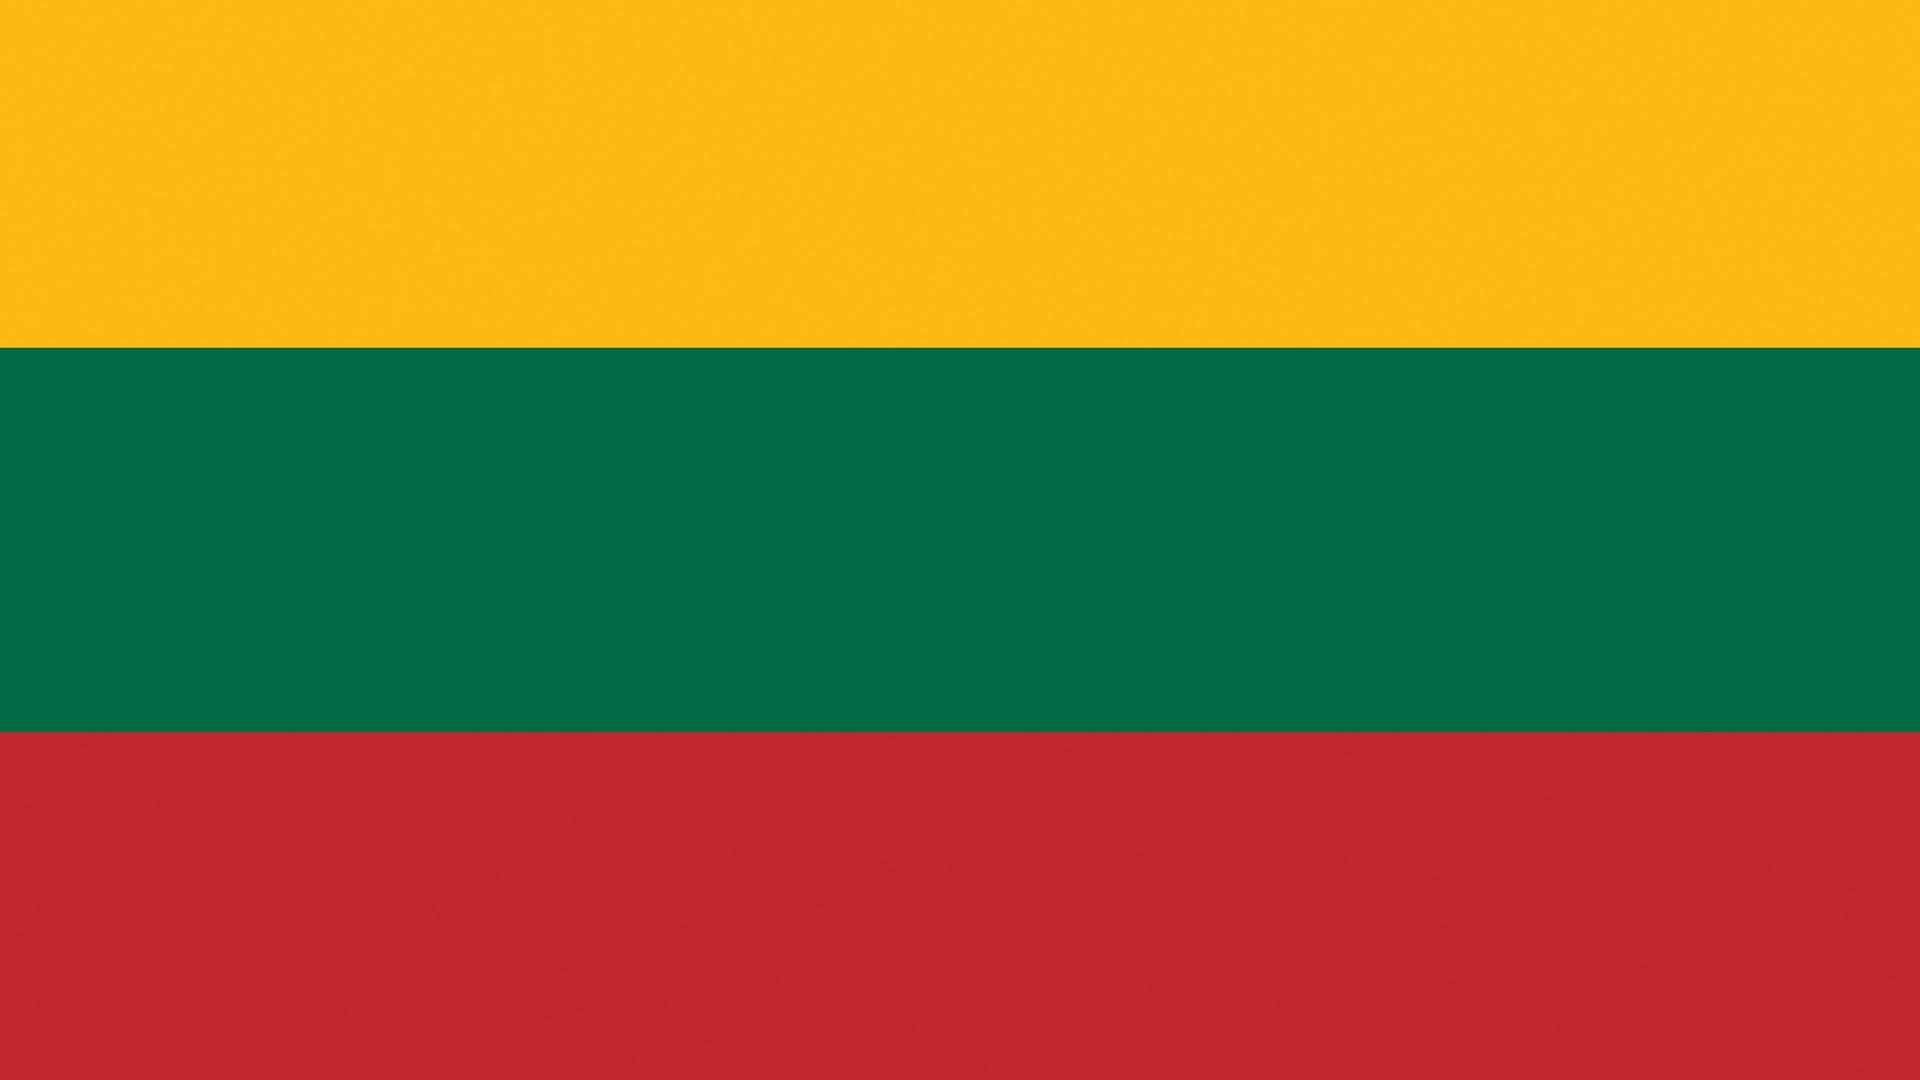 Images Lithuania Flag Stripes 1920x1080 1920x1080